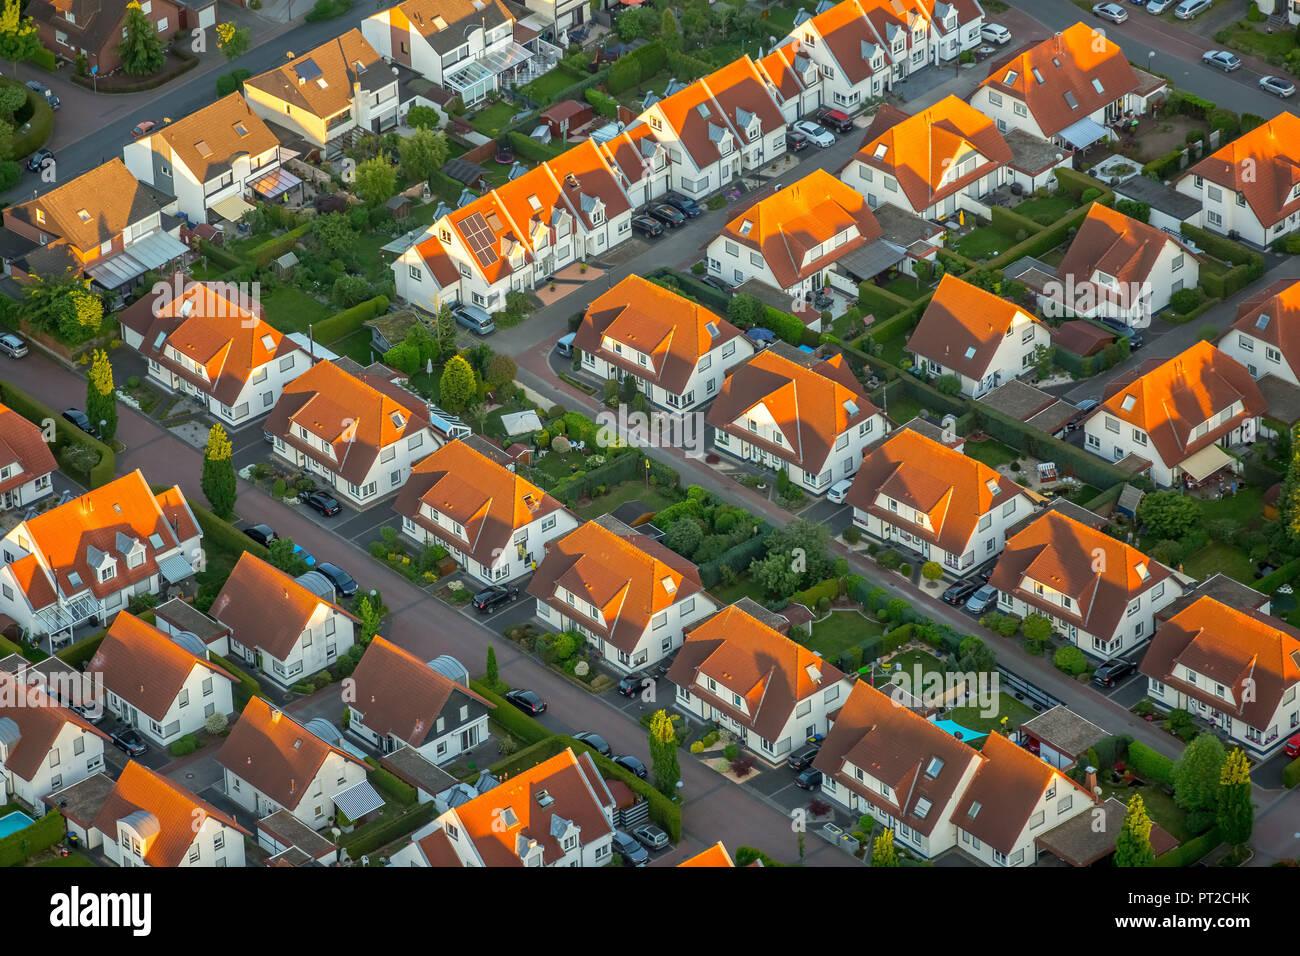 Housing estate Weidenweg, semi-detached houses, residential property, red tiled roofs, Bergkamen, Ruhr area, North Rhine-Westphalia, Germany, Europe - Stock Image